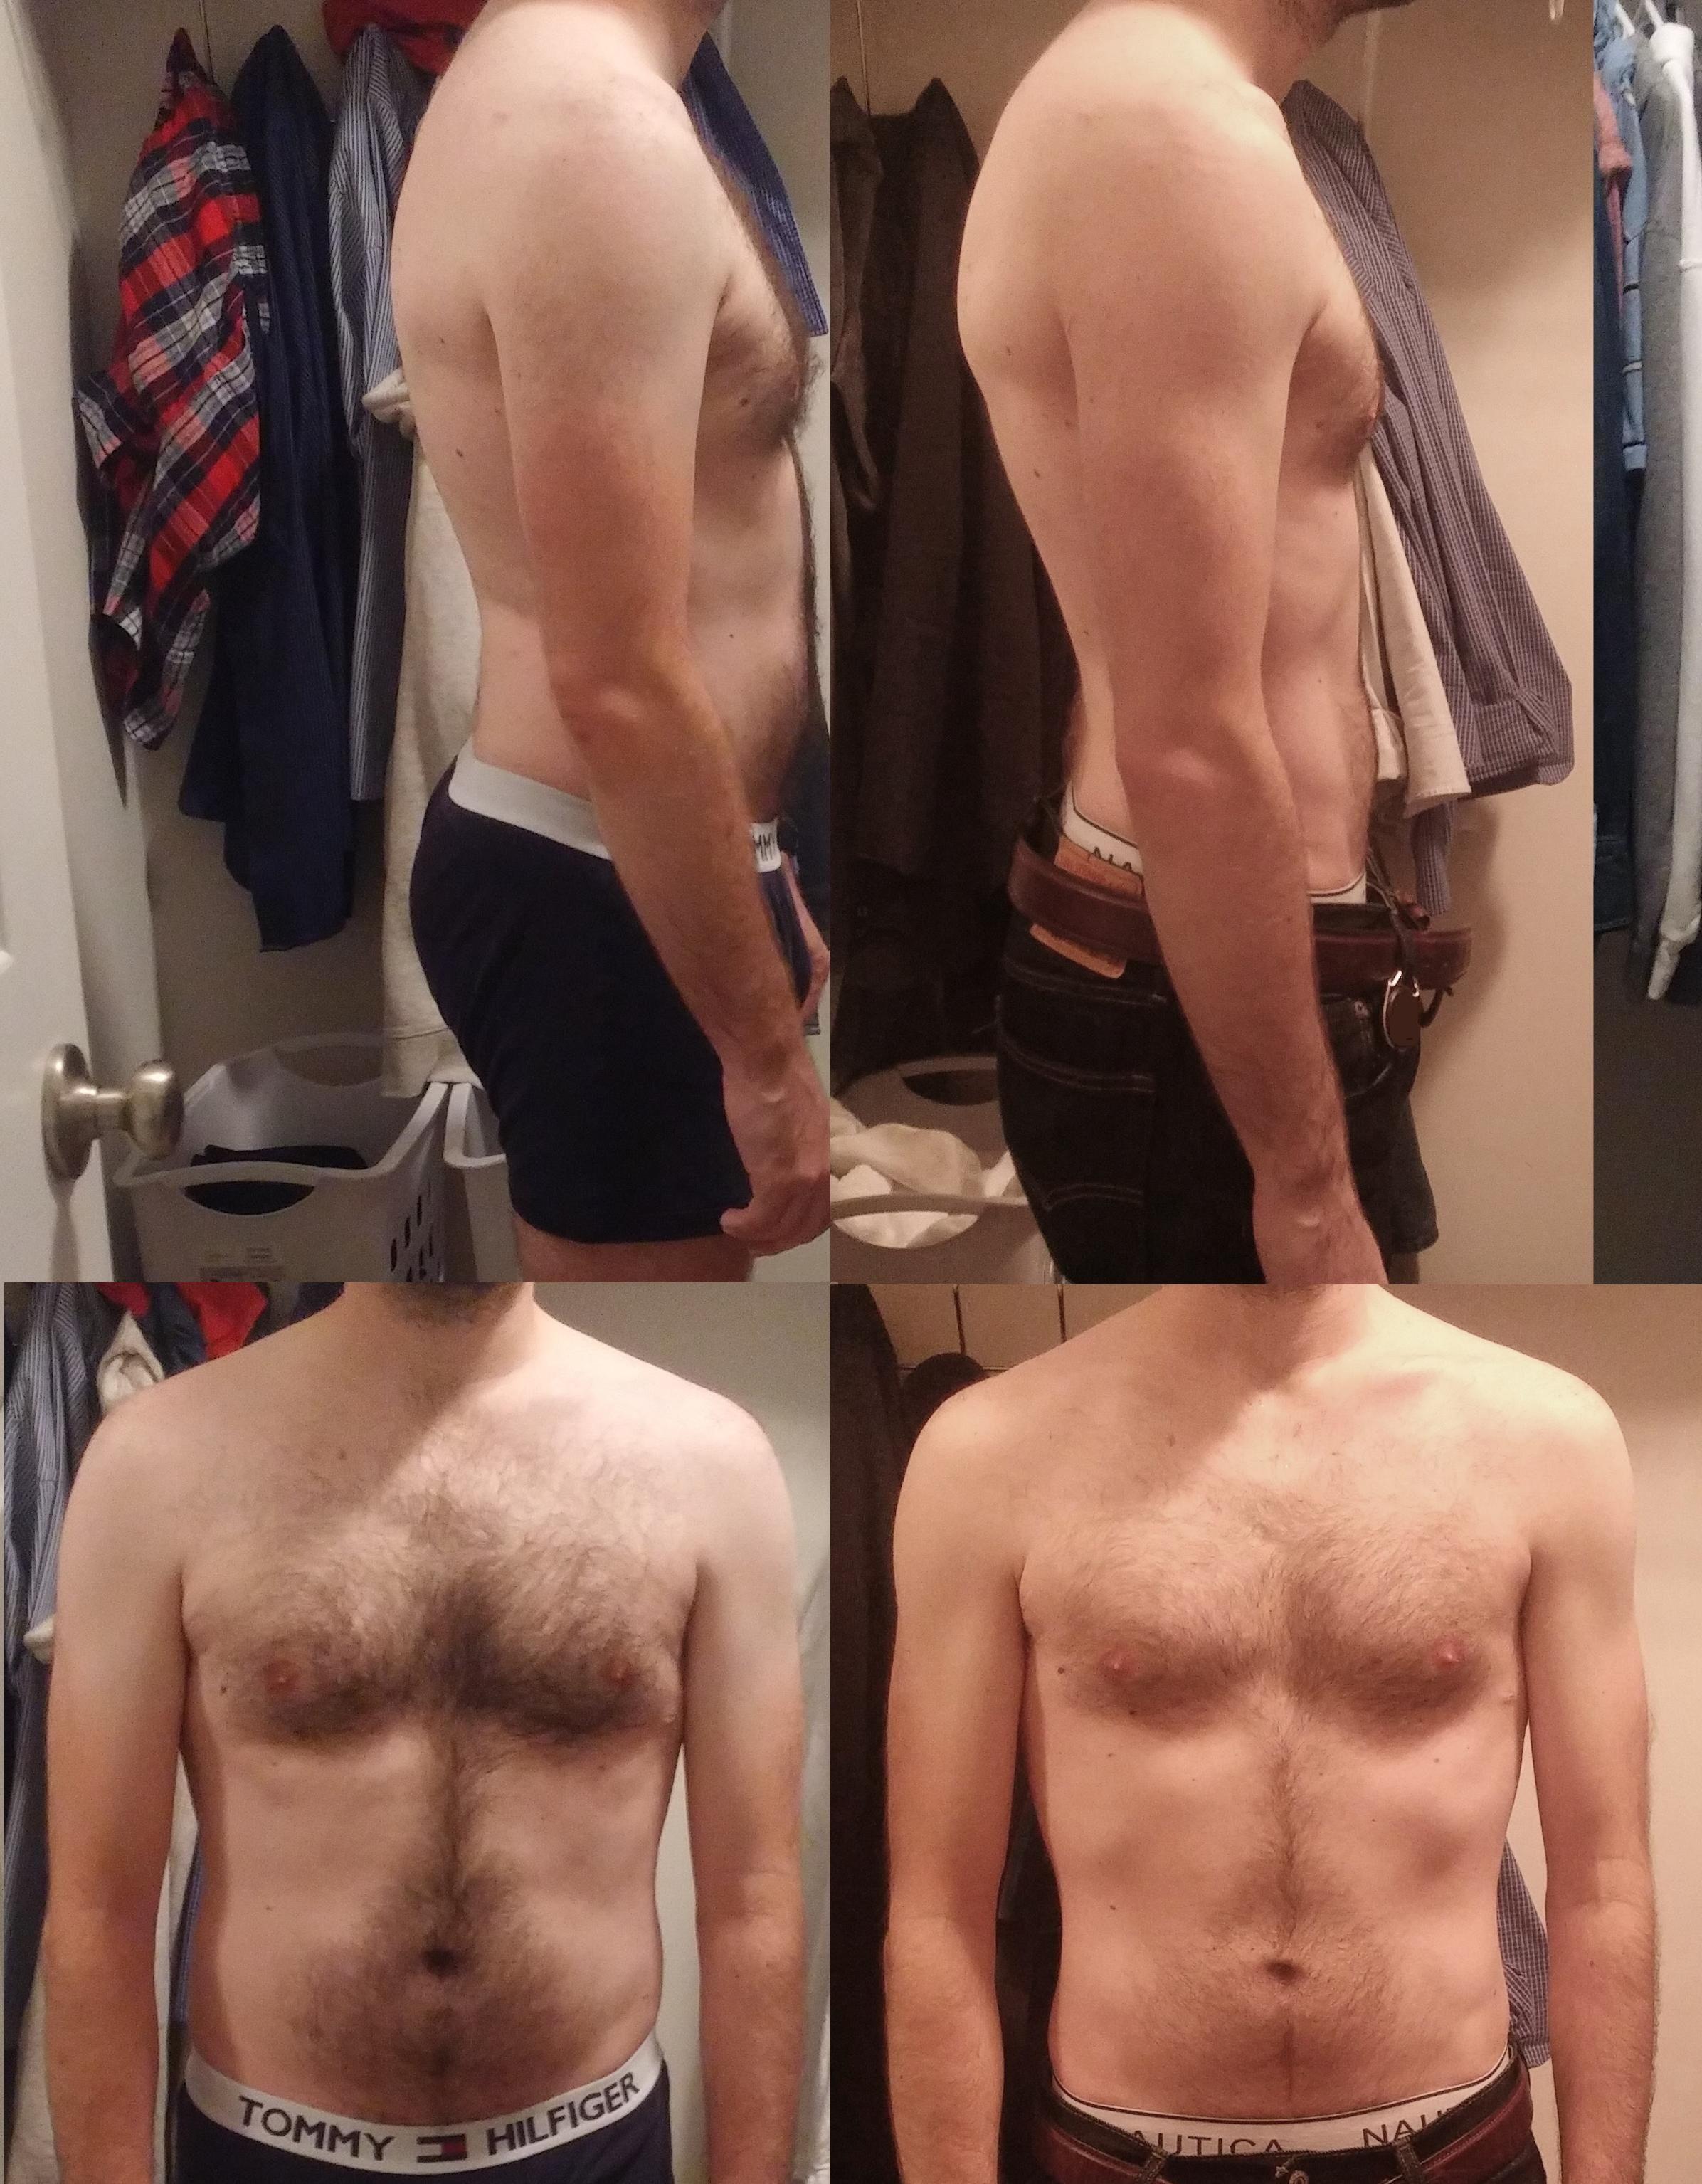 Does emergen c help lose weight image 3